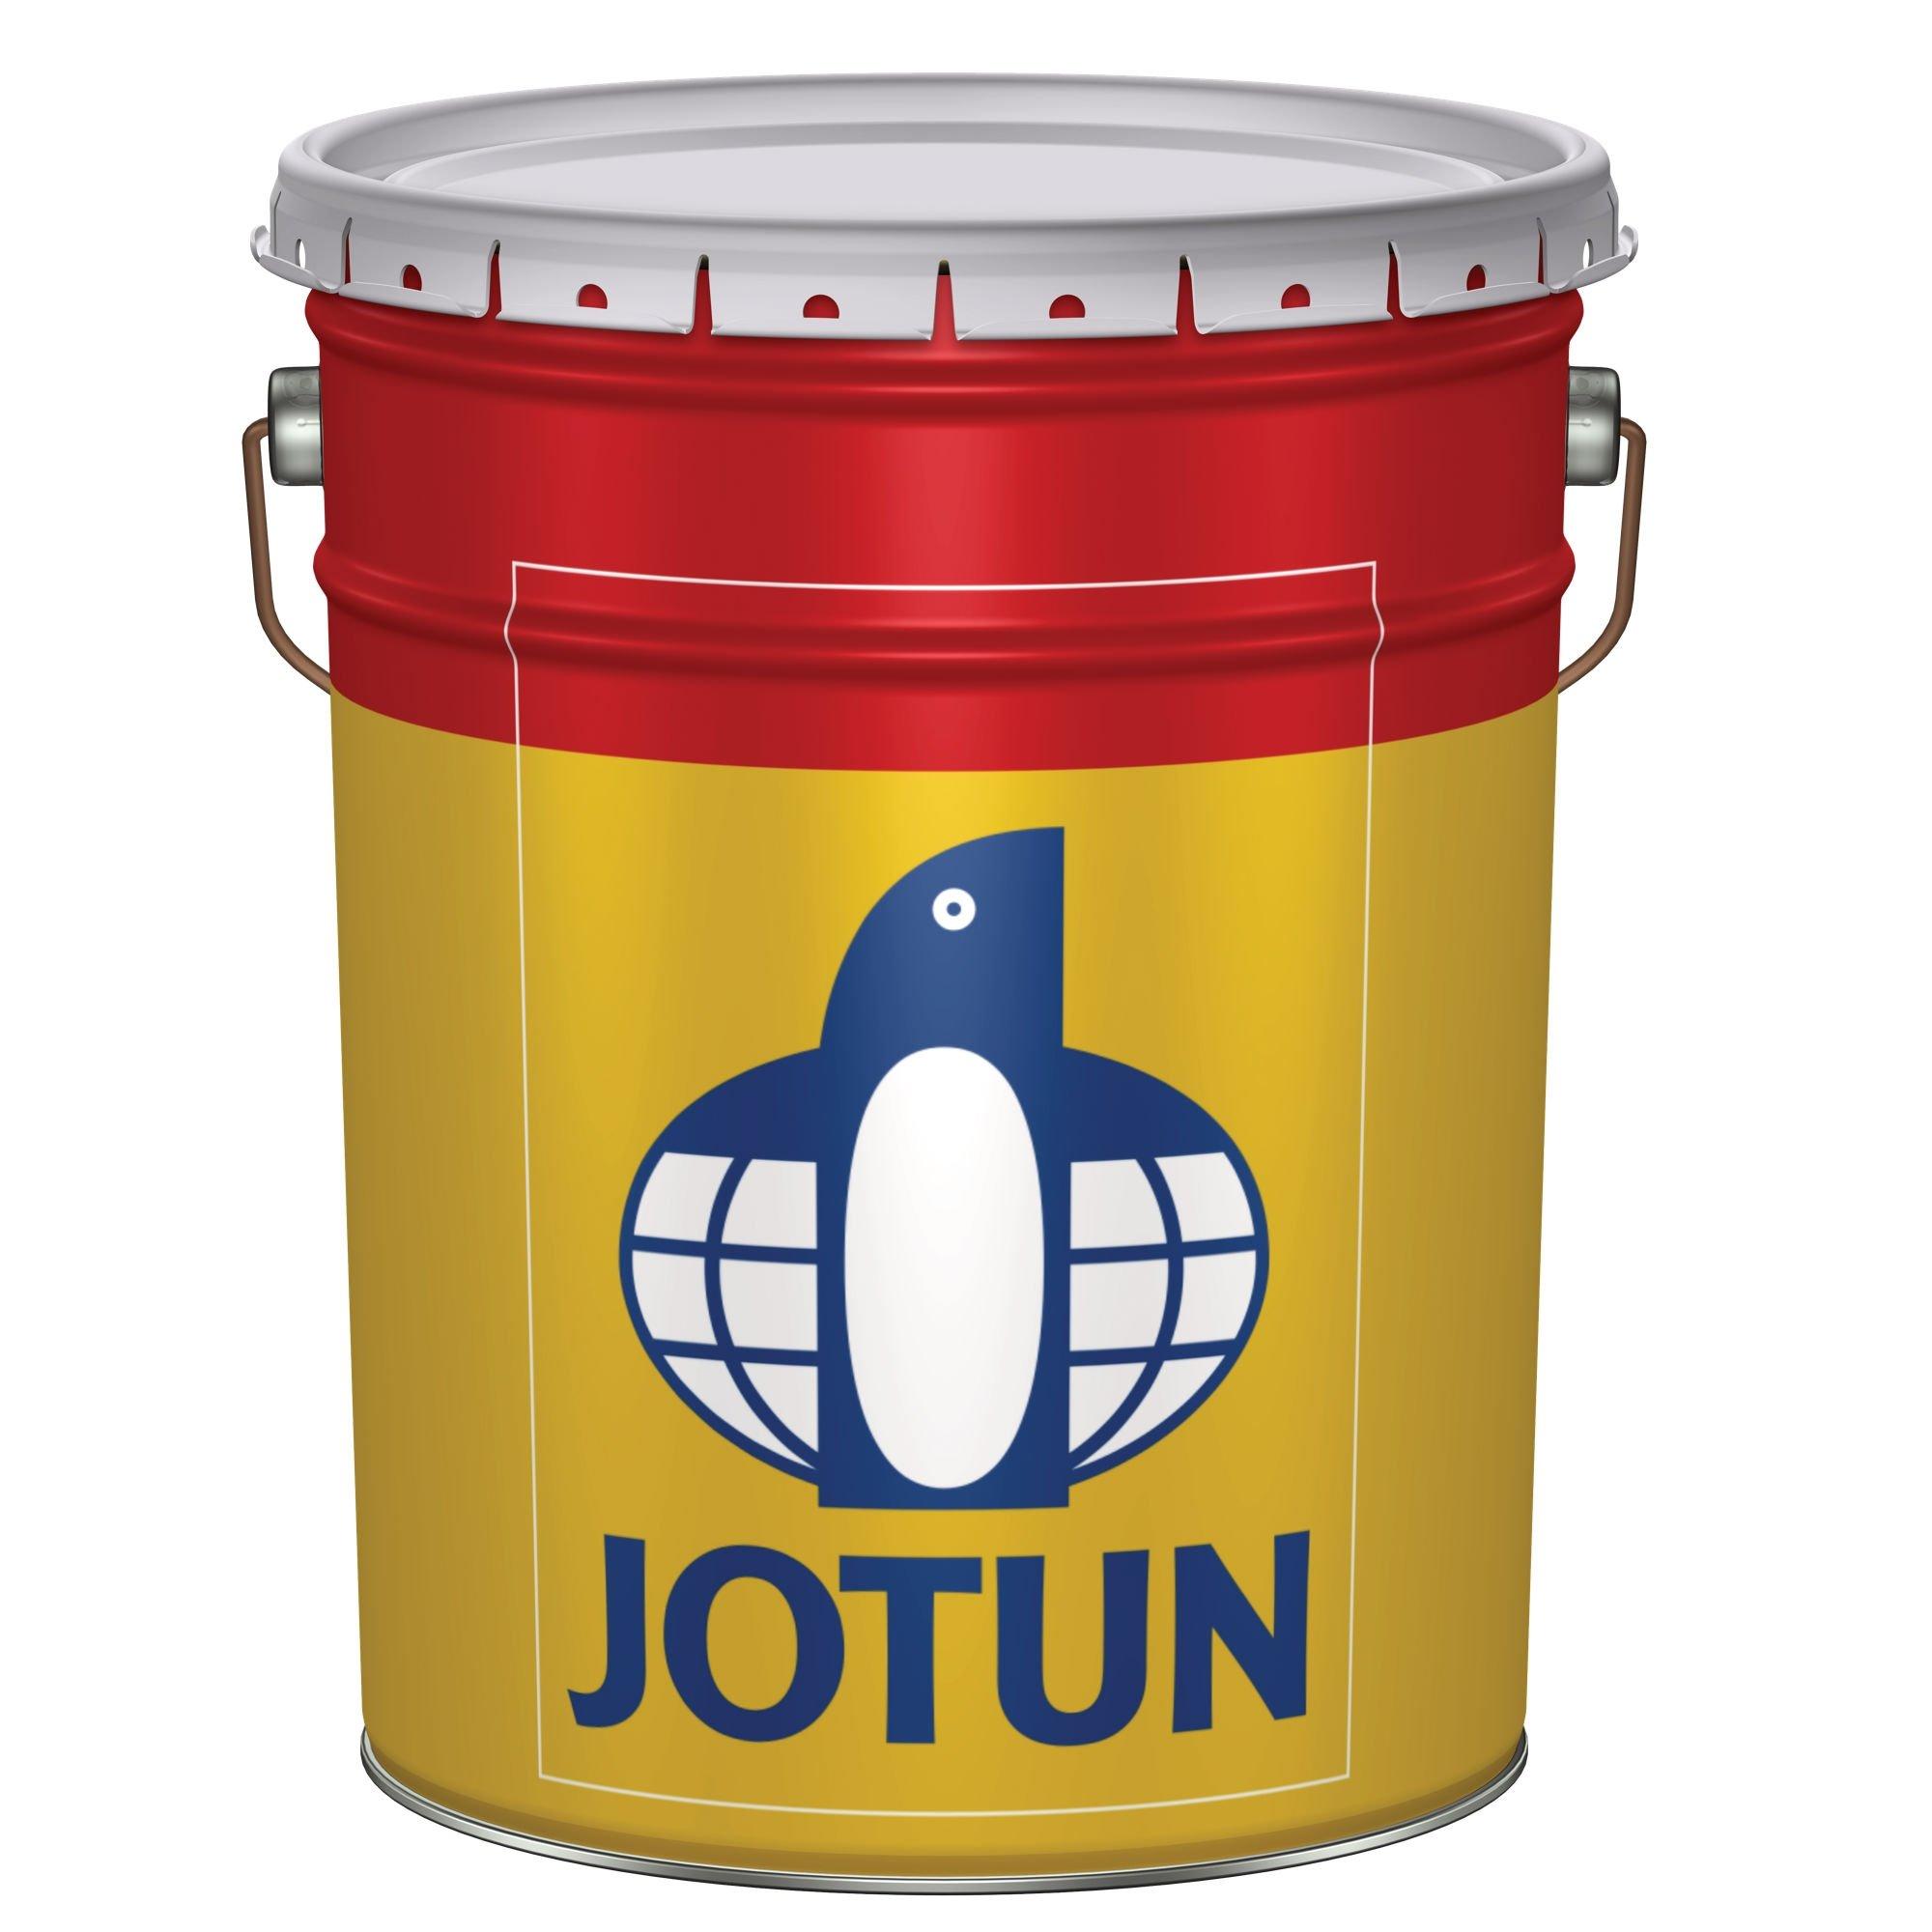 Jotun Pilot 2 Marine/Maskinmaling-10 L